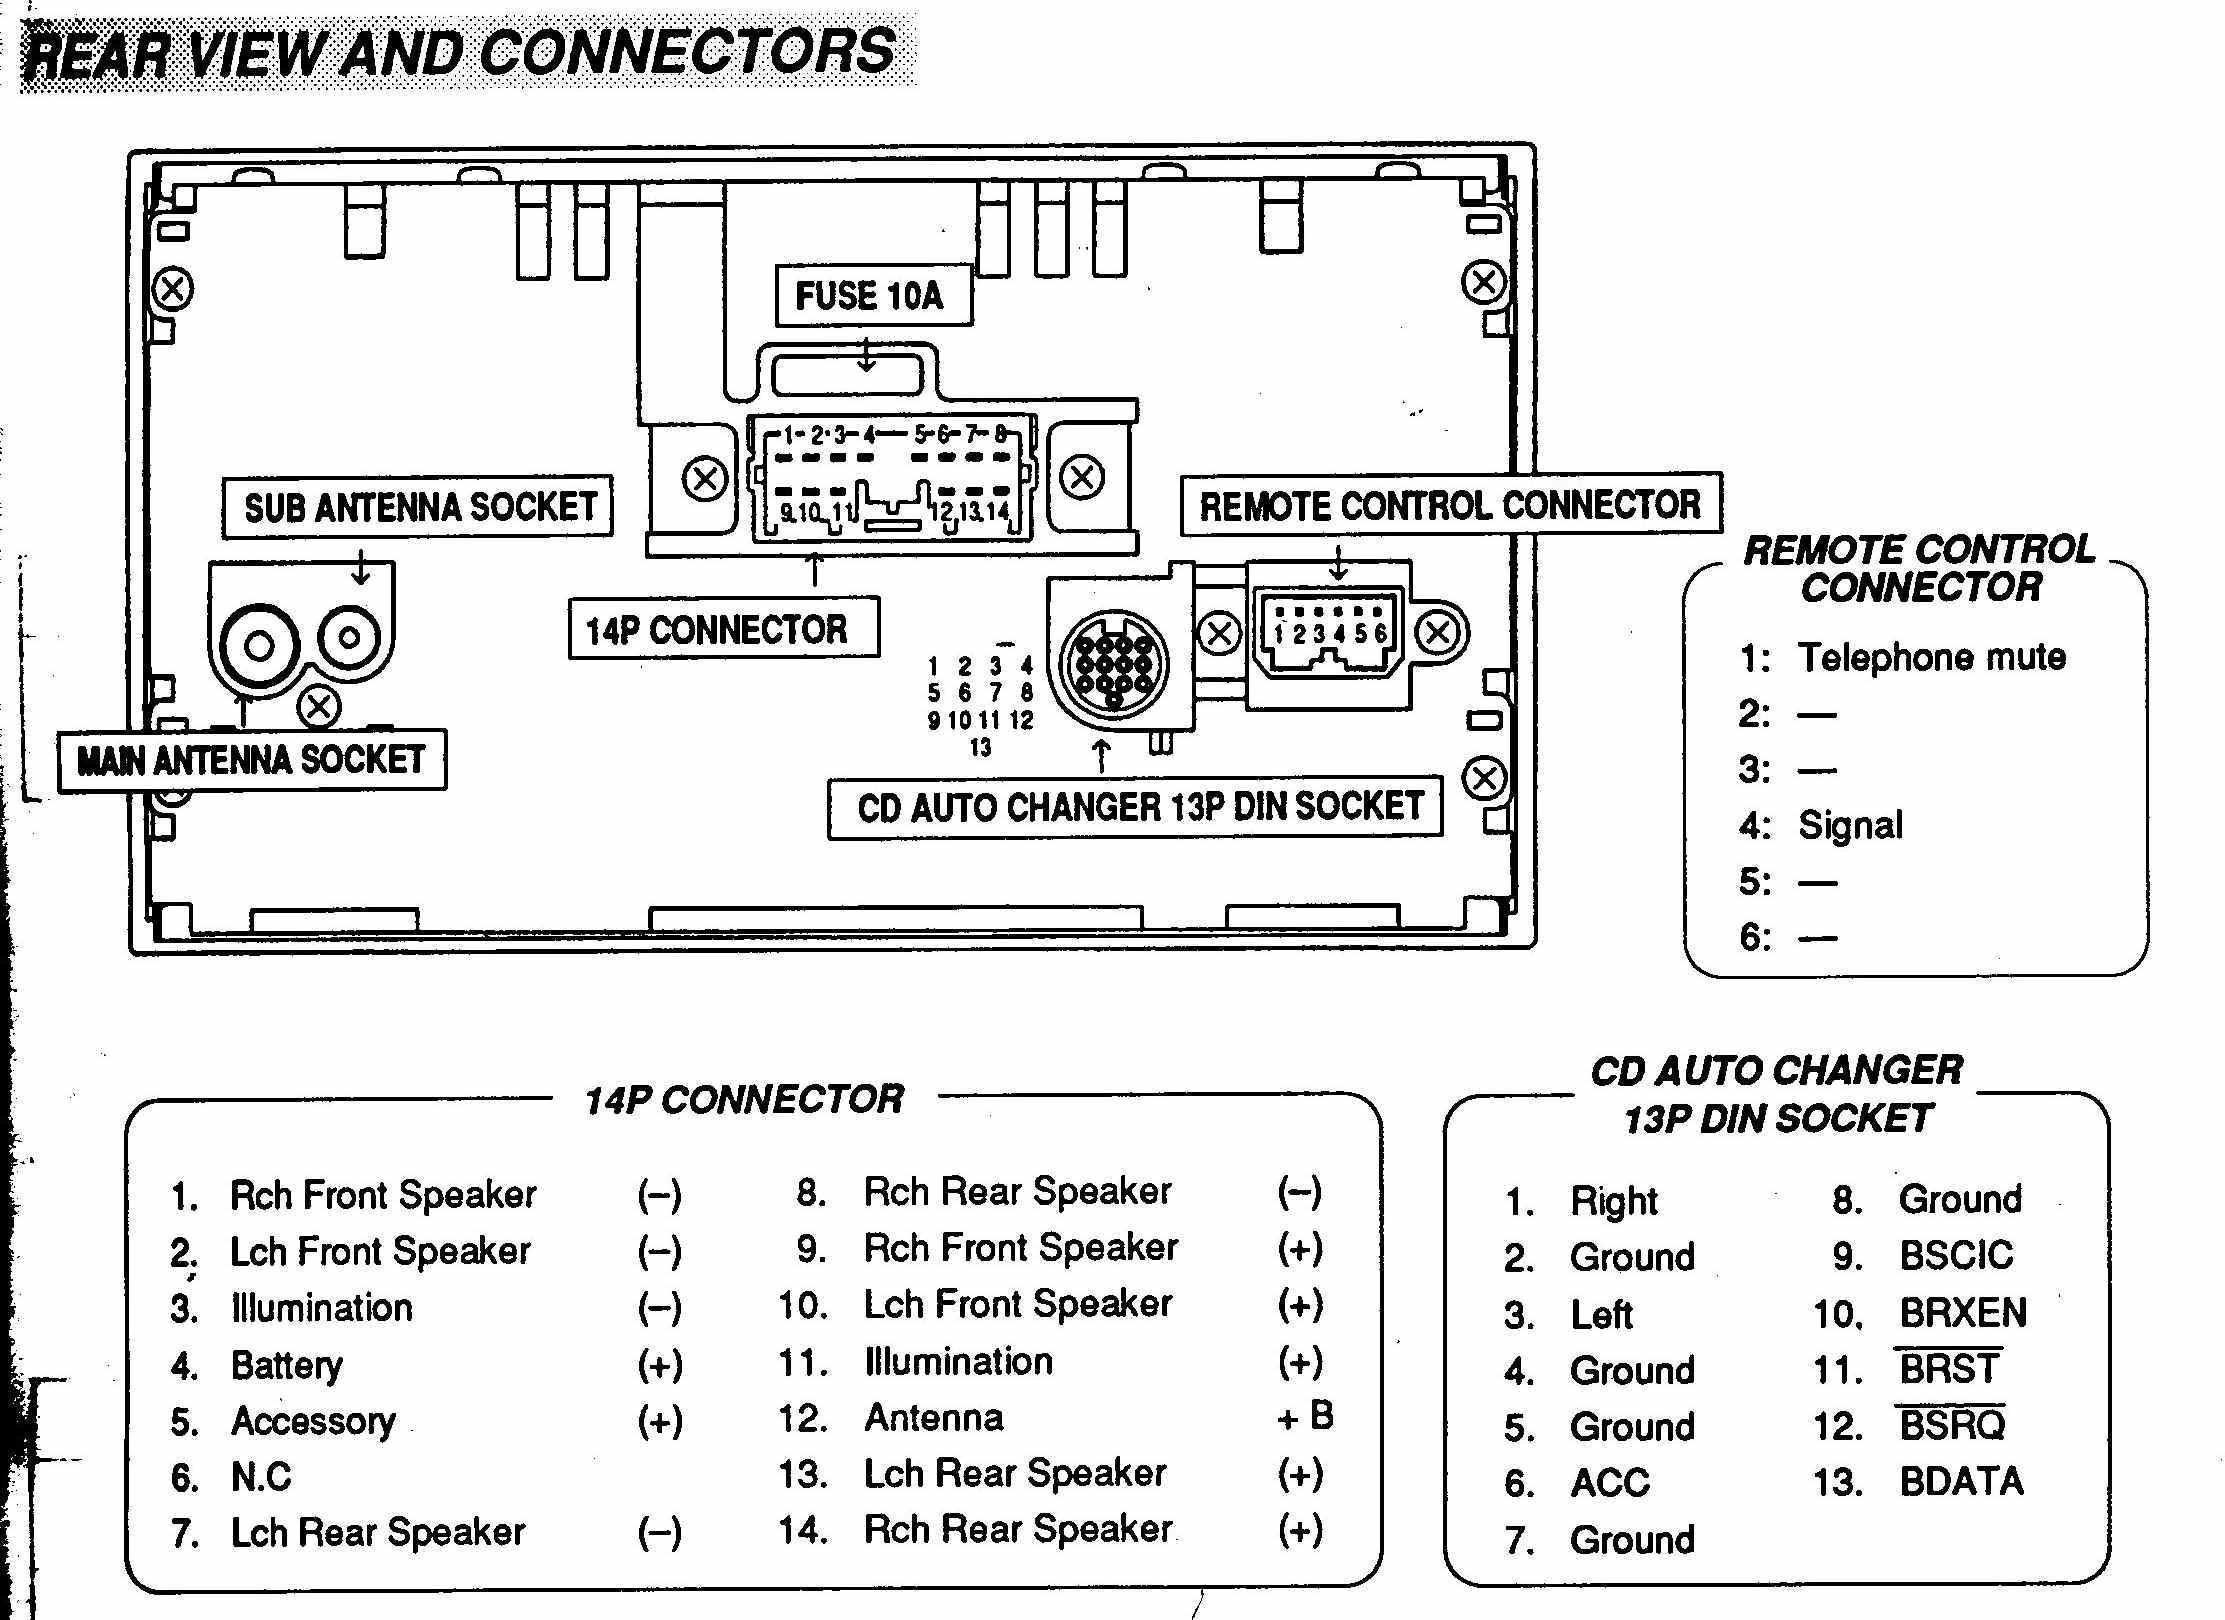 2006 Vw Jetta Radio Wiring Diagram Wiring Diagram Moreover 2001 Mitsubishi Eclipse Radio Wiring Diagram Of 2006 Vw Jetta Radio Wiring Diagram